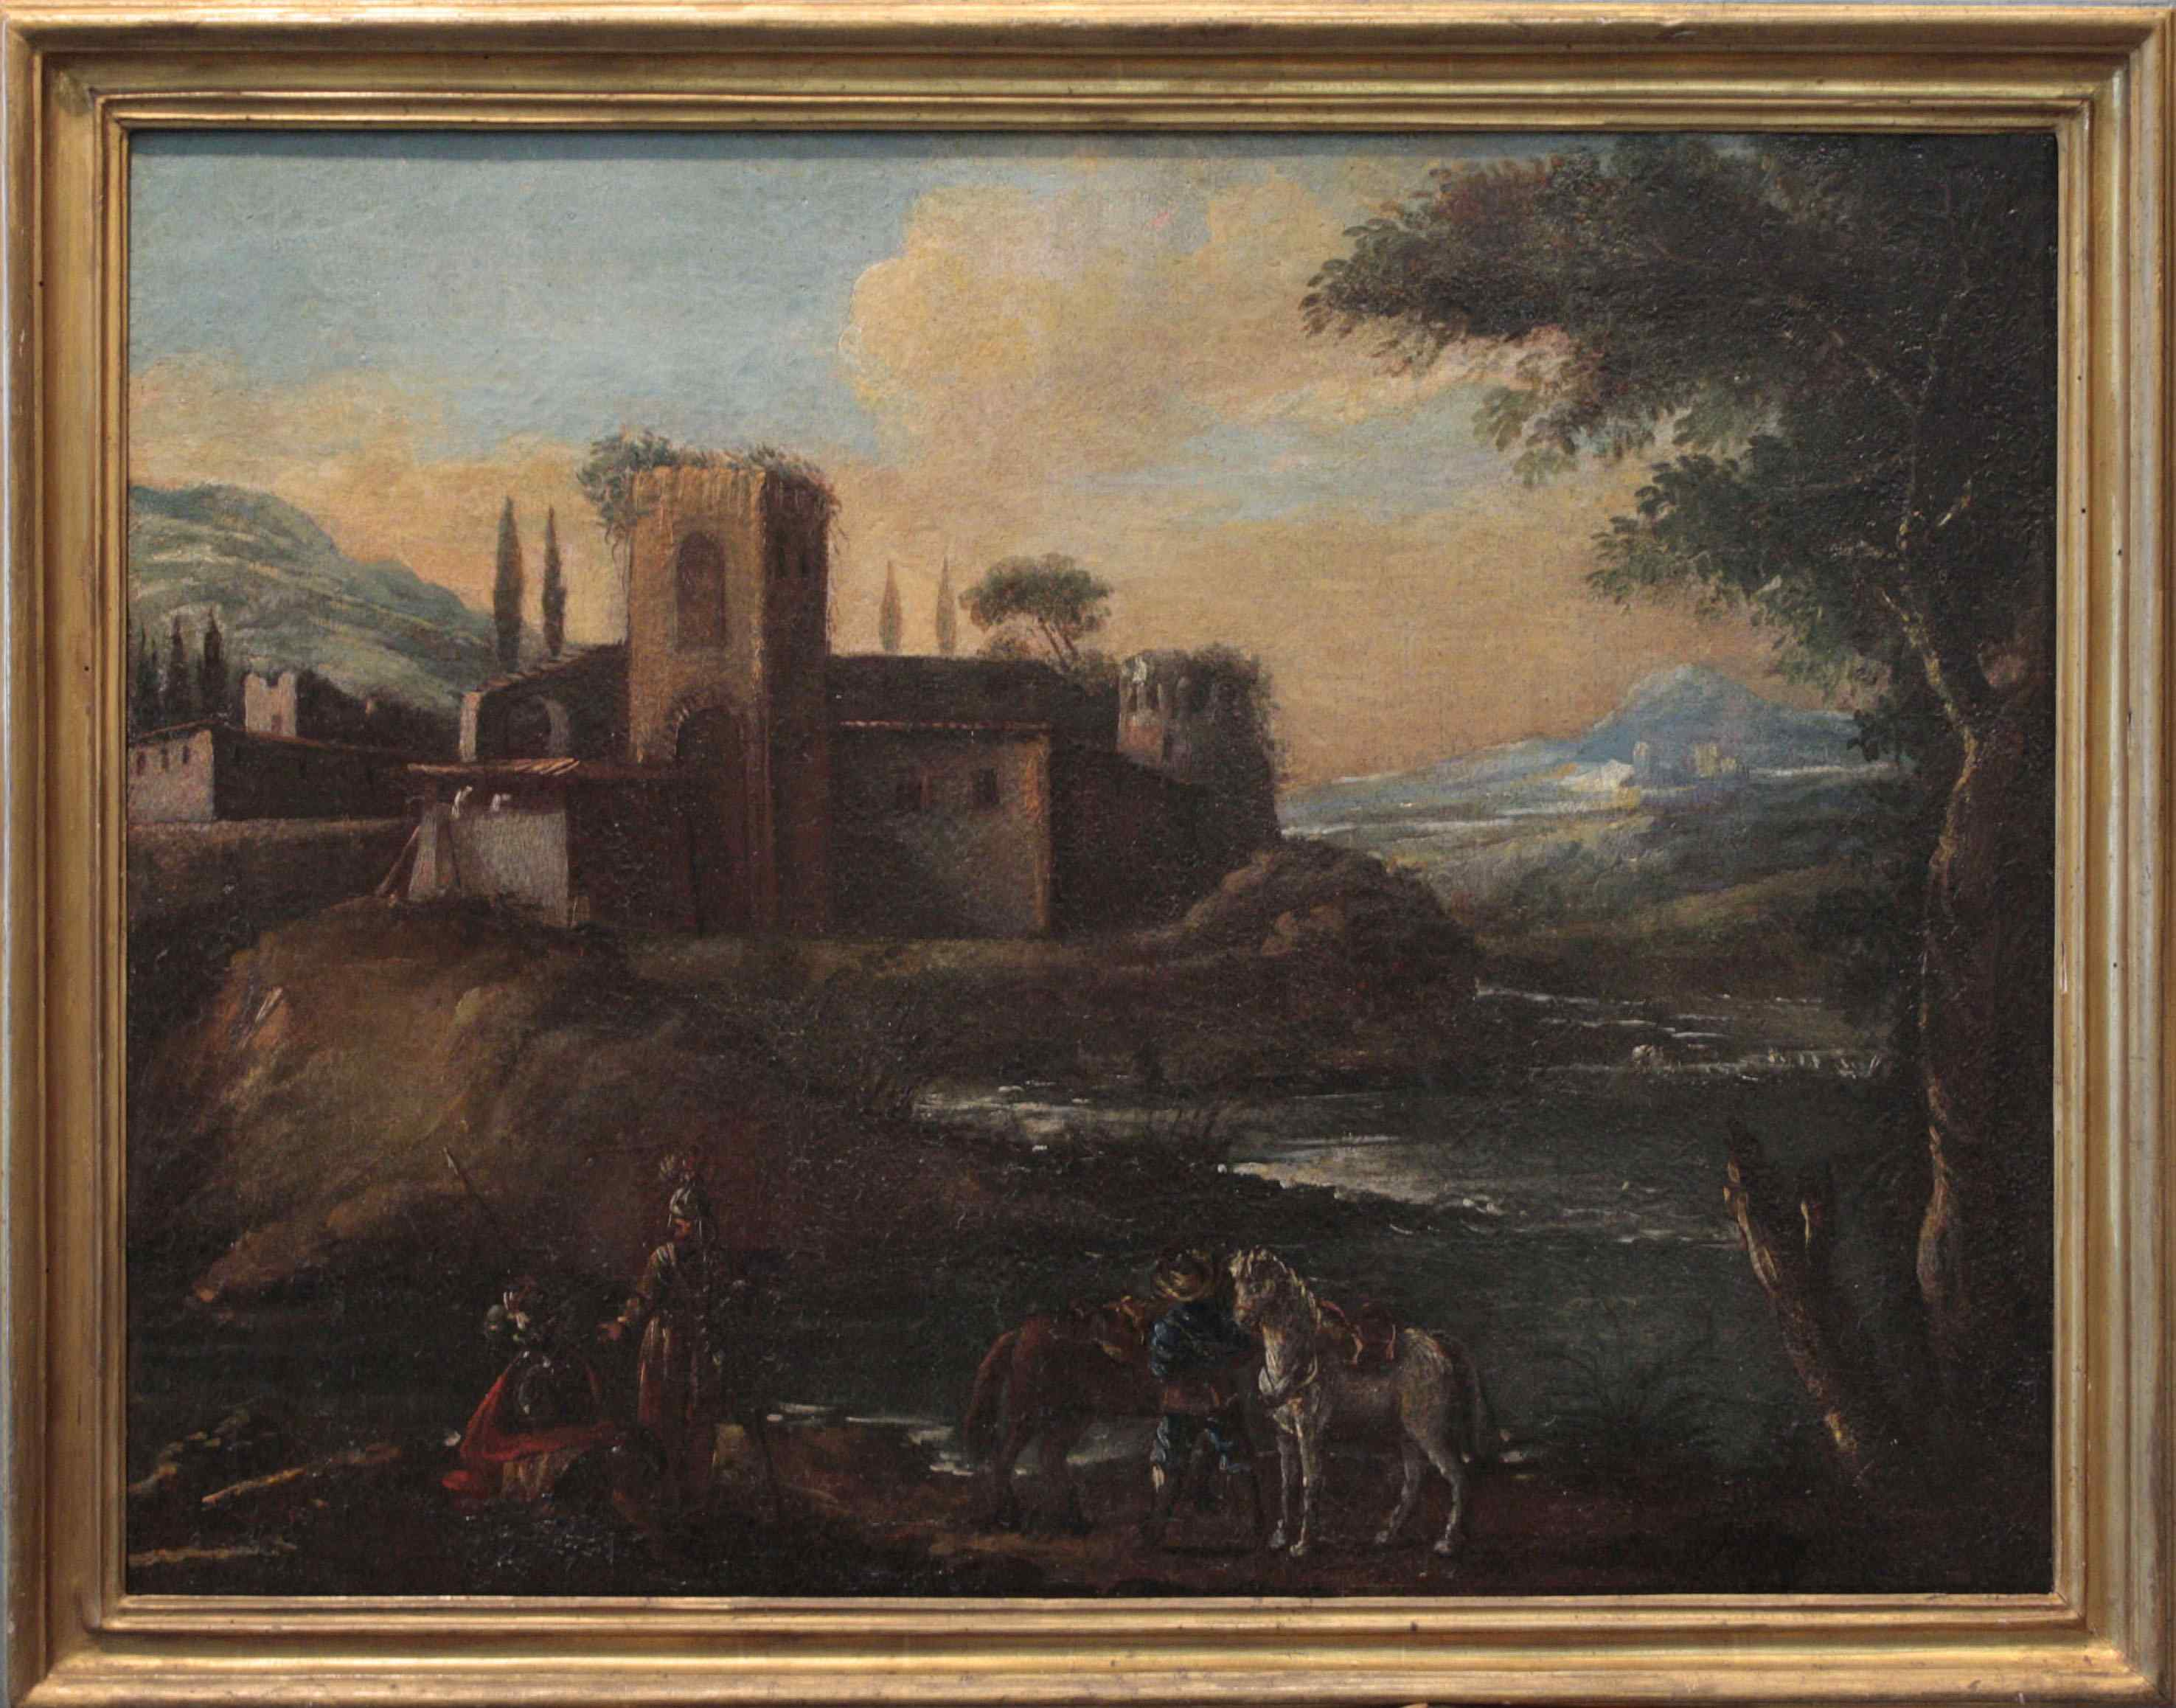 Пейзаж с фигурами, сек. XVIII